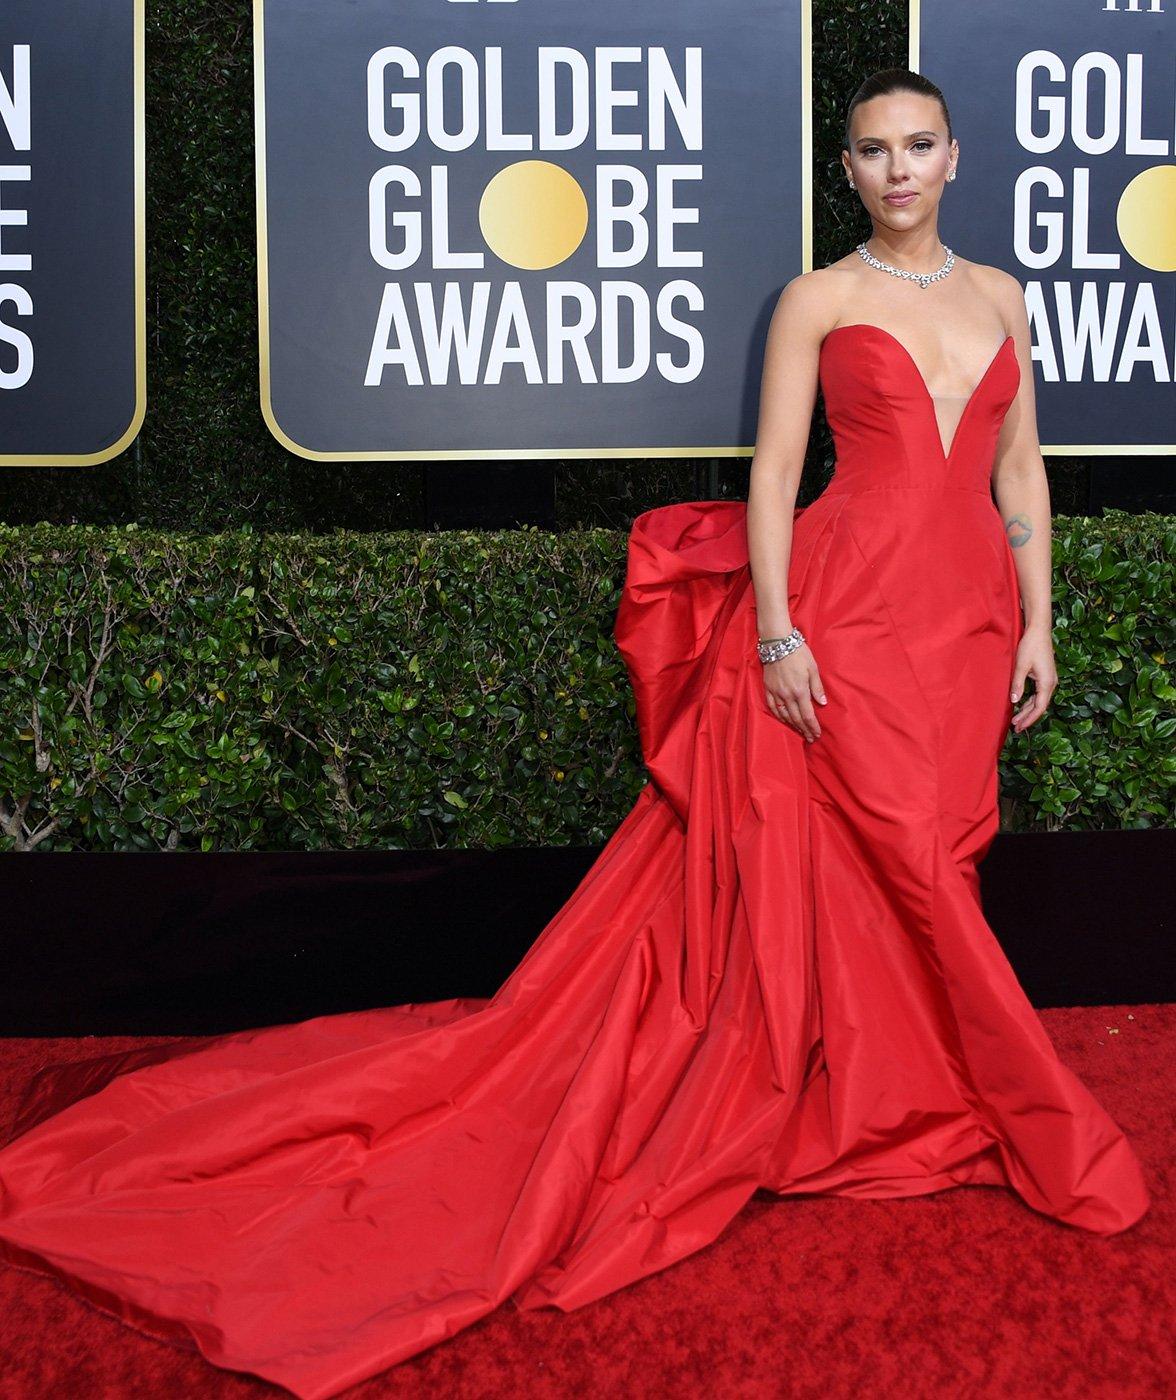 Scarlett Johansson drips glamour in Vera Wang at the 2020 Golden Globe Awards